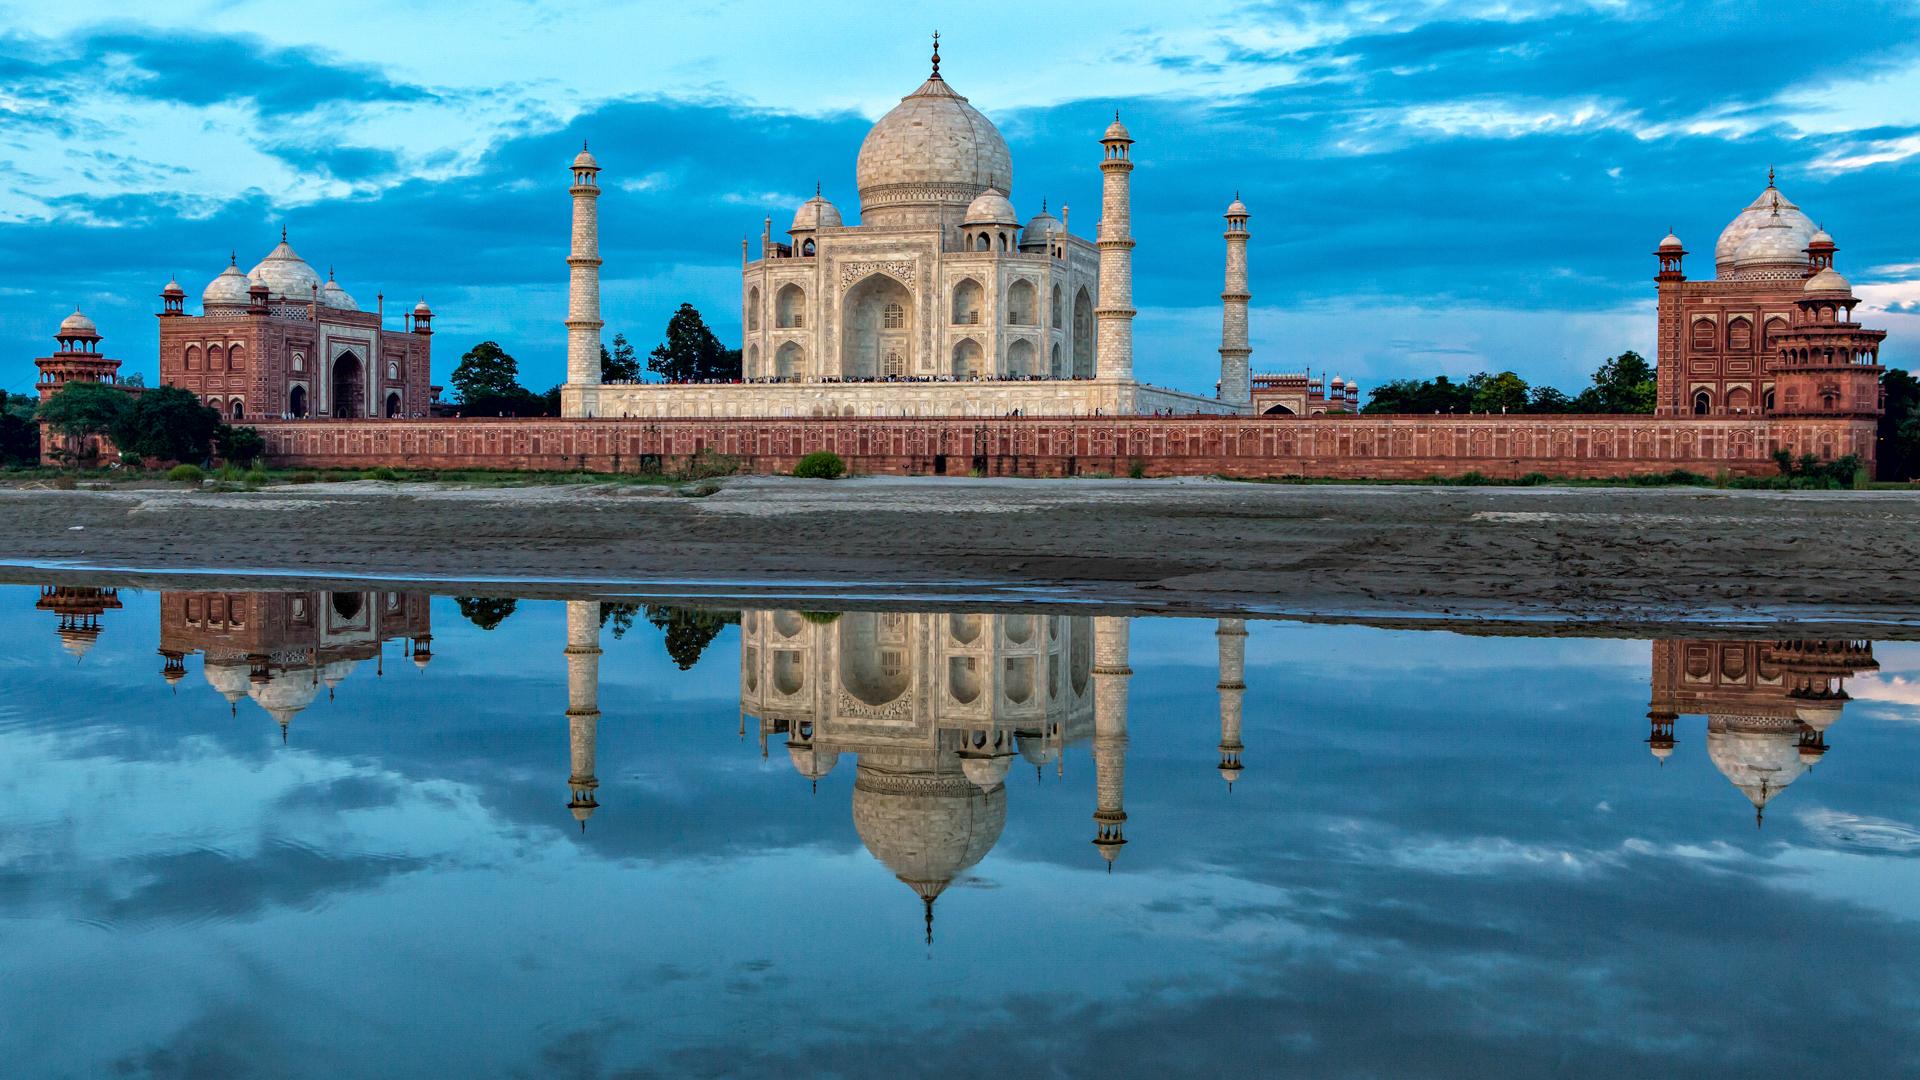 Слайд 22 из 30: Lock2017-B6_India_TajMahalIndia_500px-76648297_1920x1080